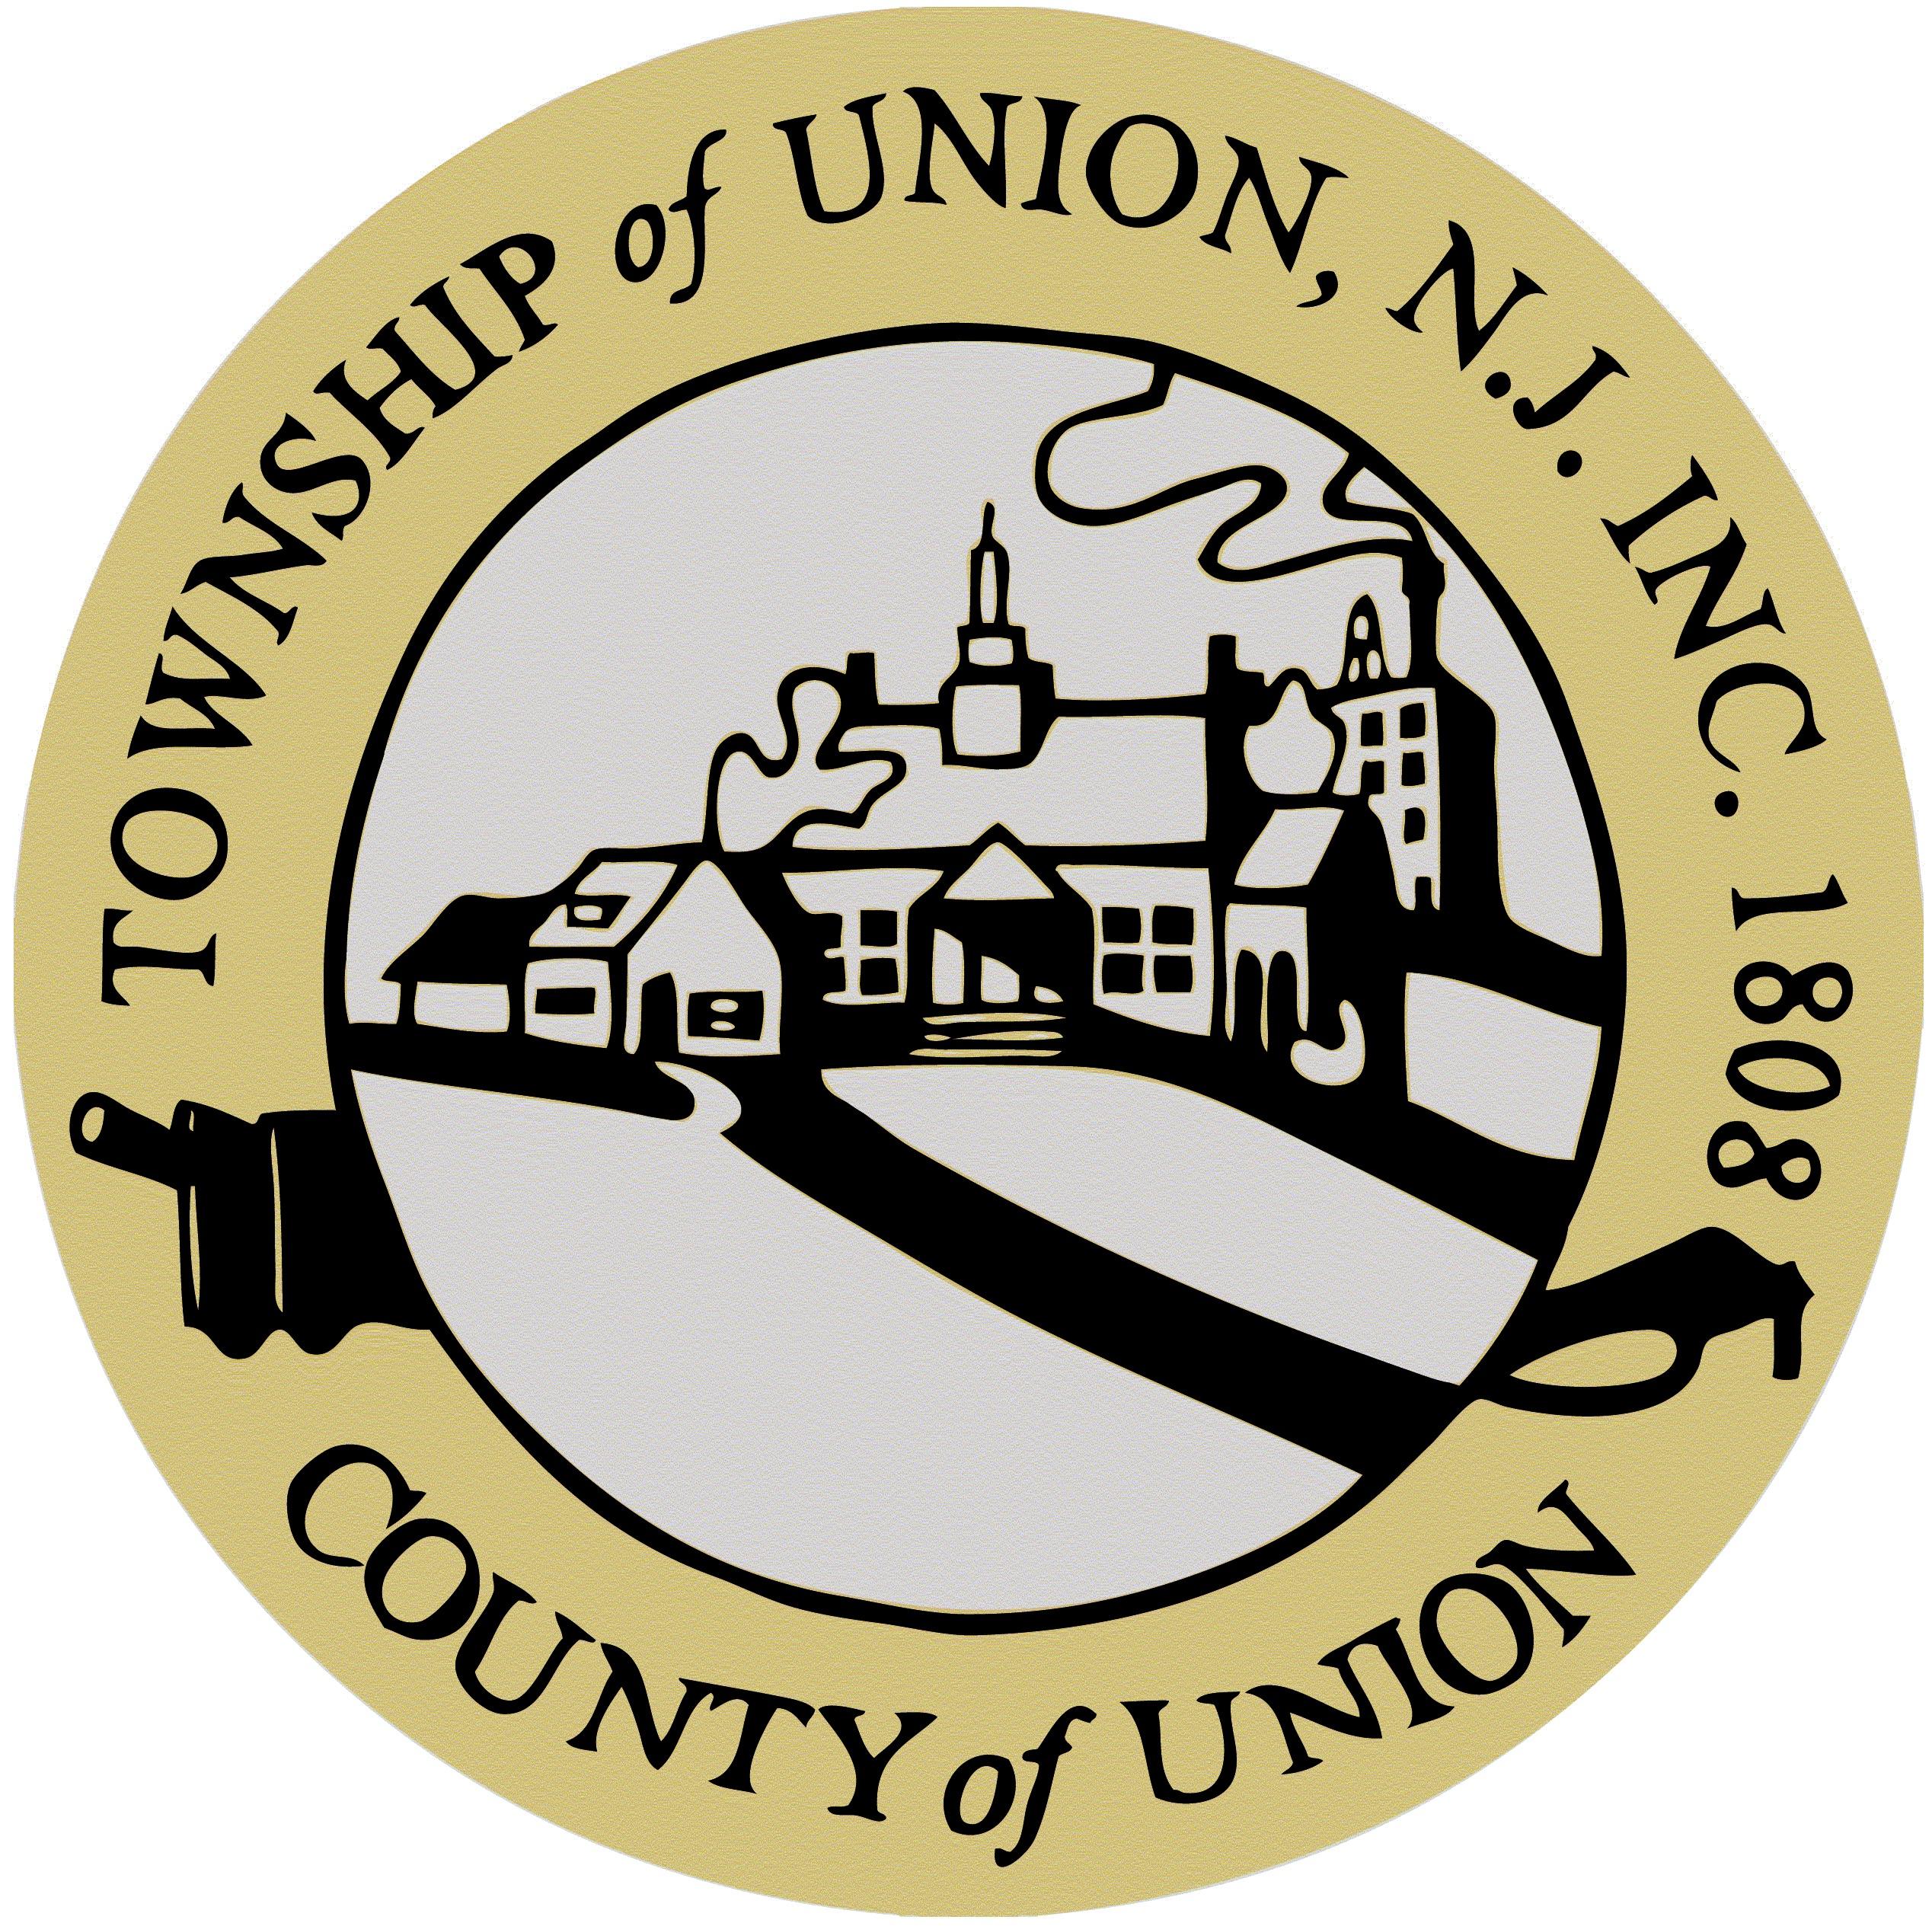 132609e0fcf928eea421_union_township_seal.jpg